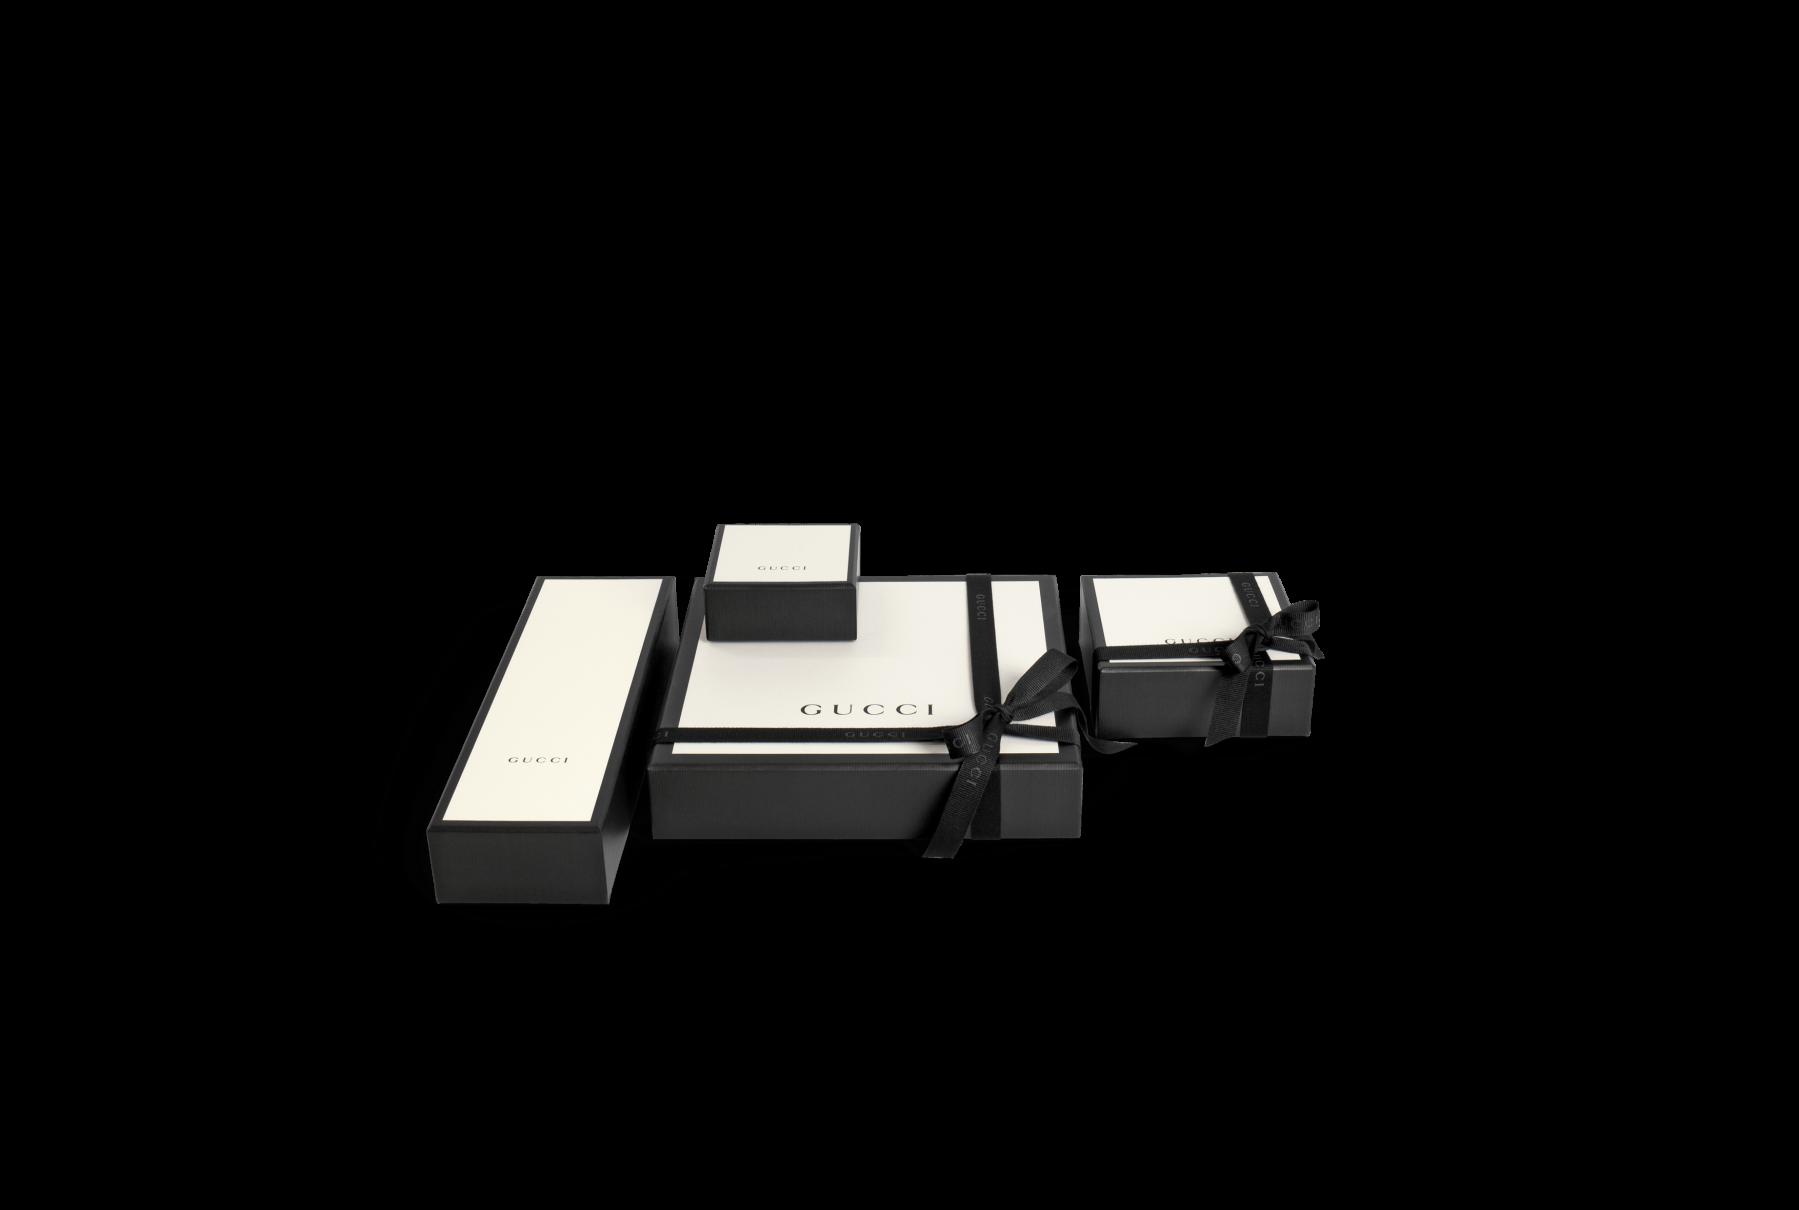 Gucci Interlocking G Charm Link Bracelet in Sterling Silver packaging